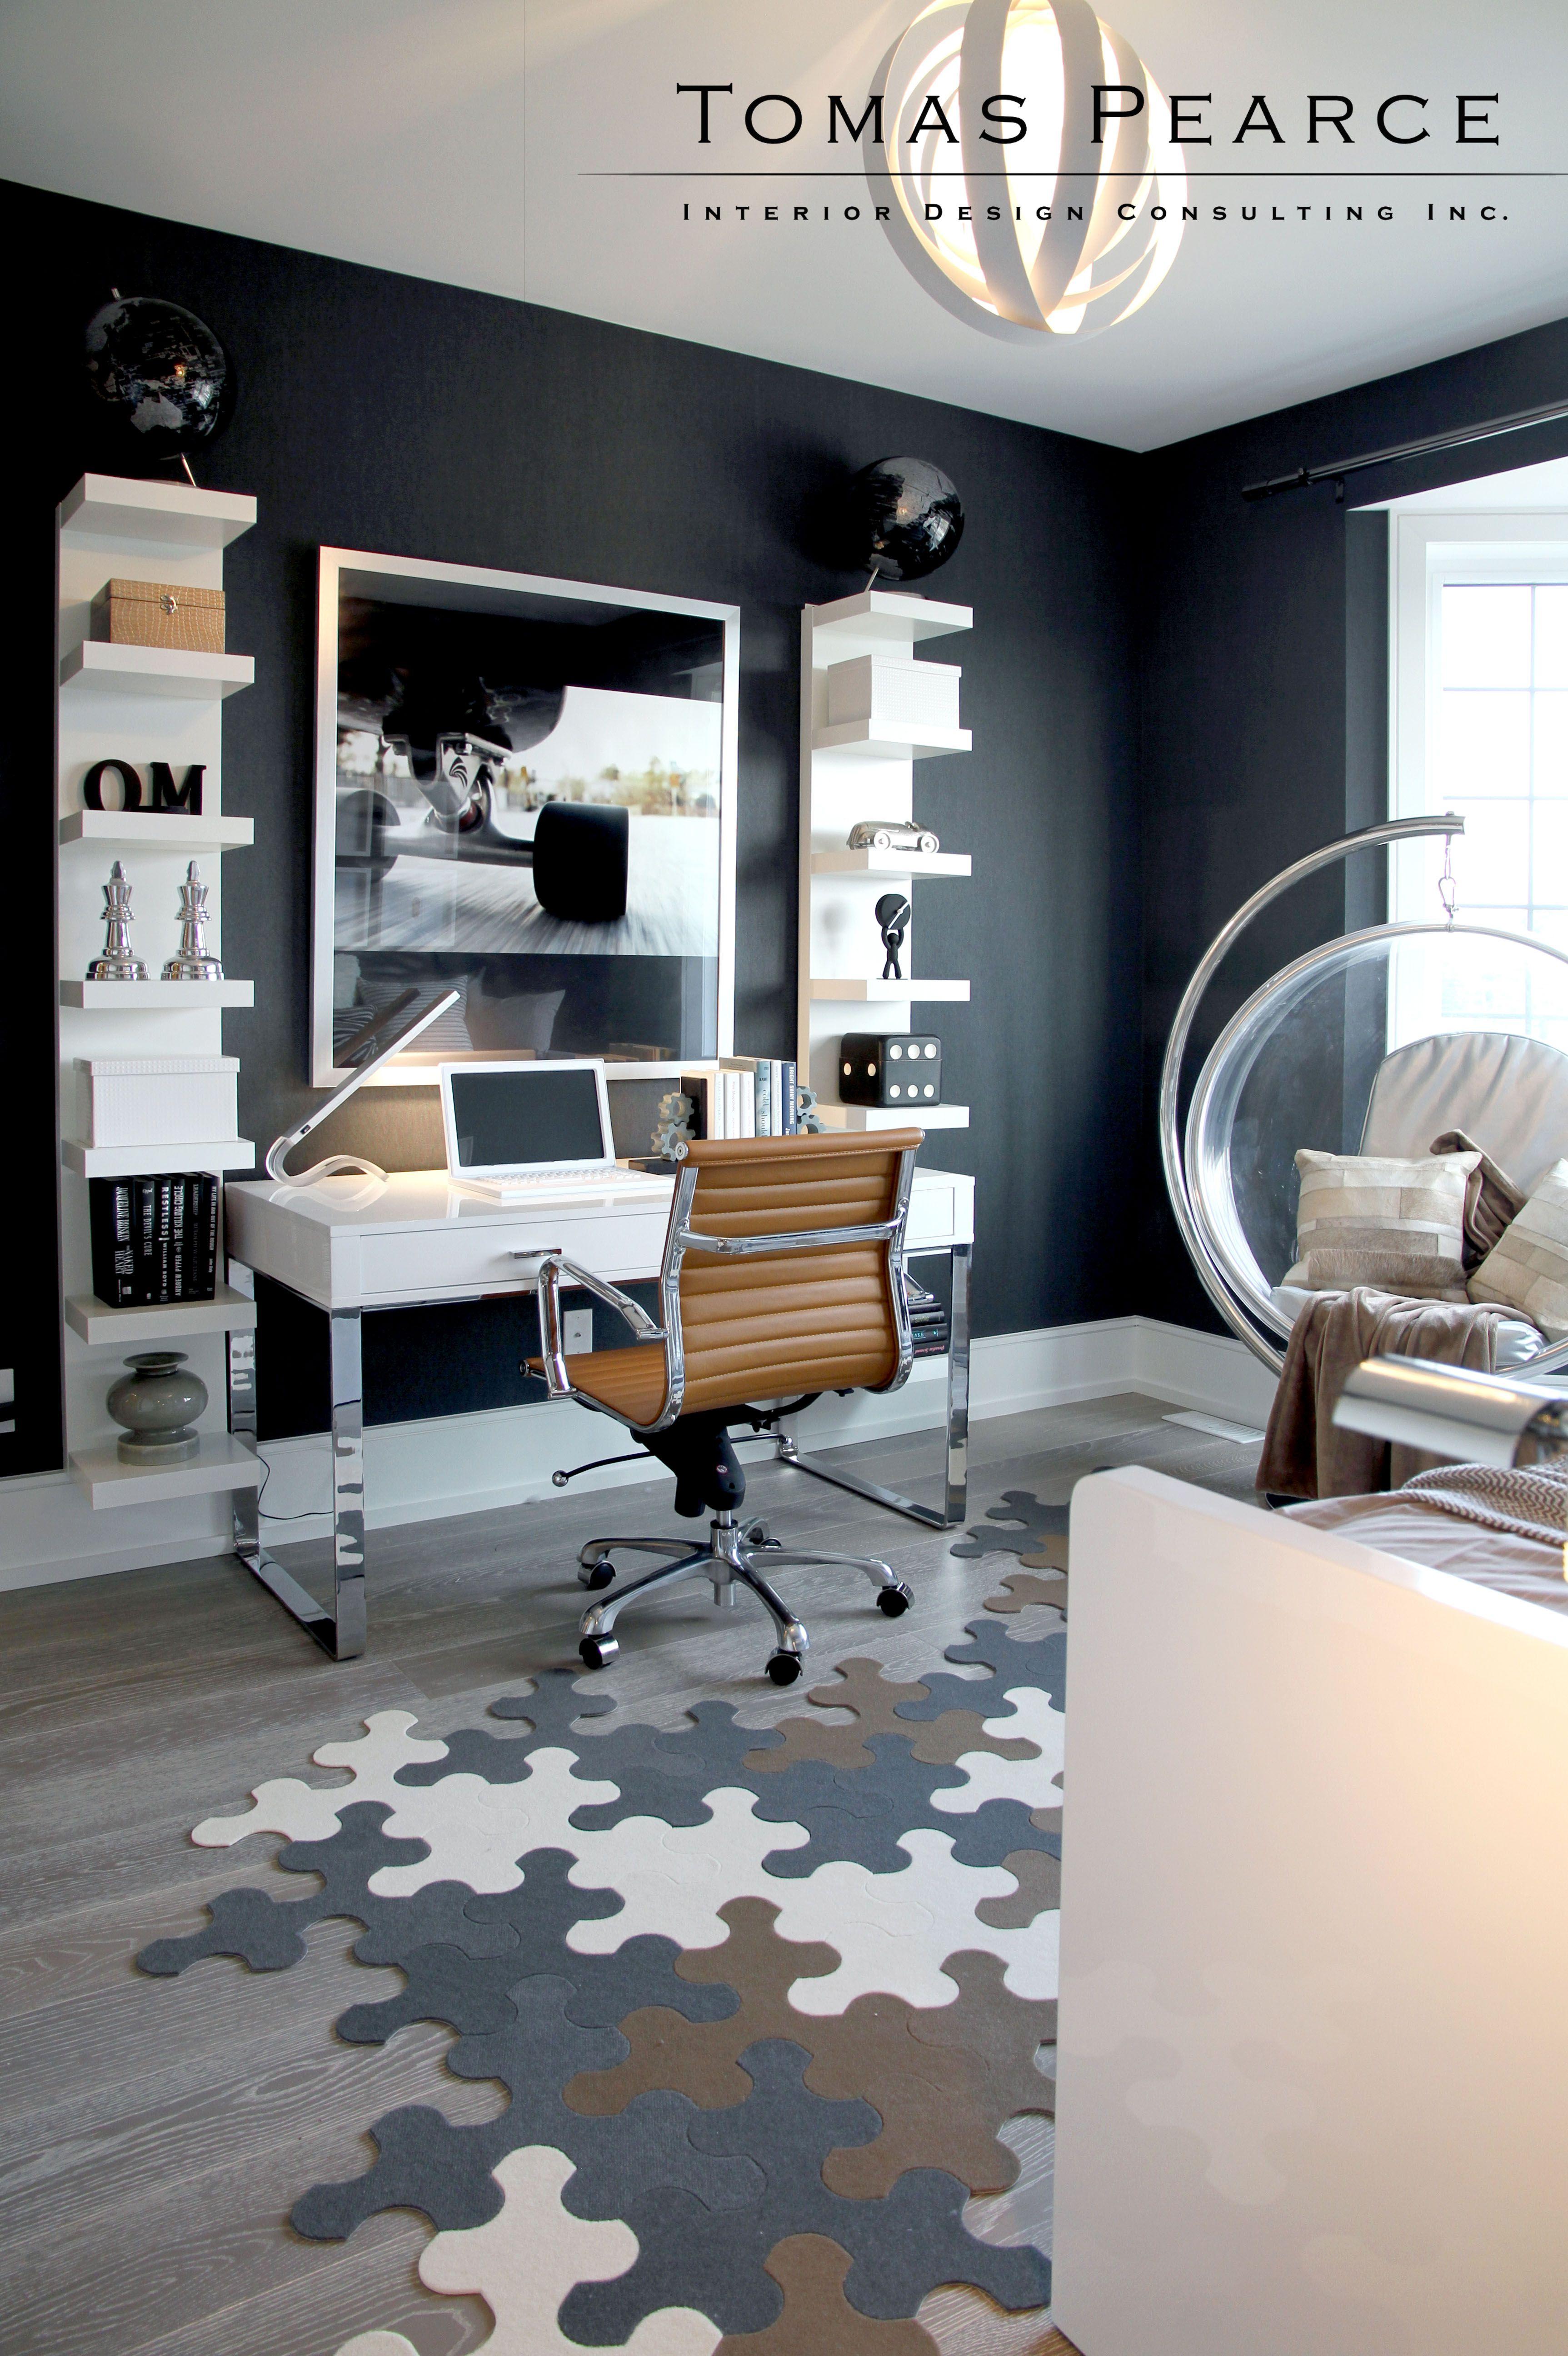 Best Study Room Design: Study Room Design, Room Design, Study Room